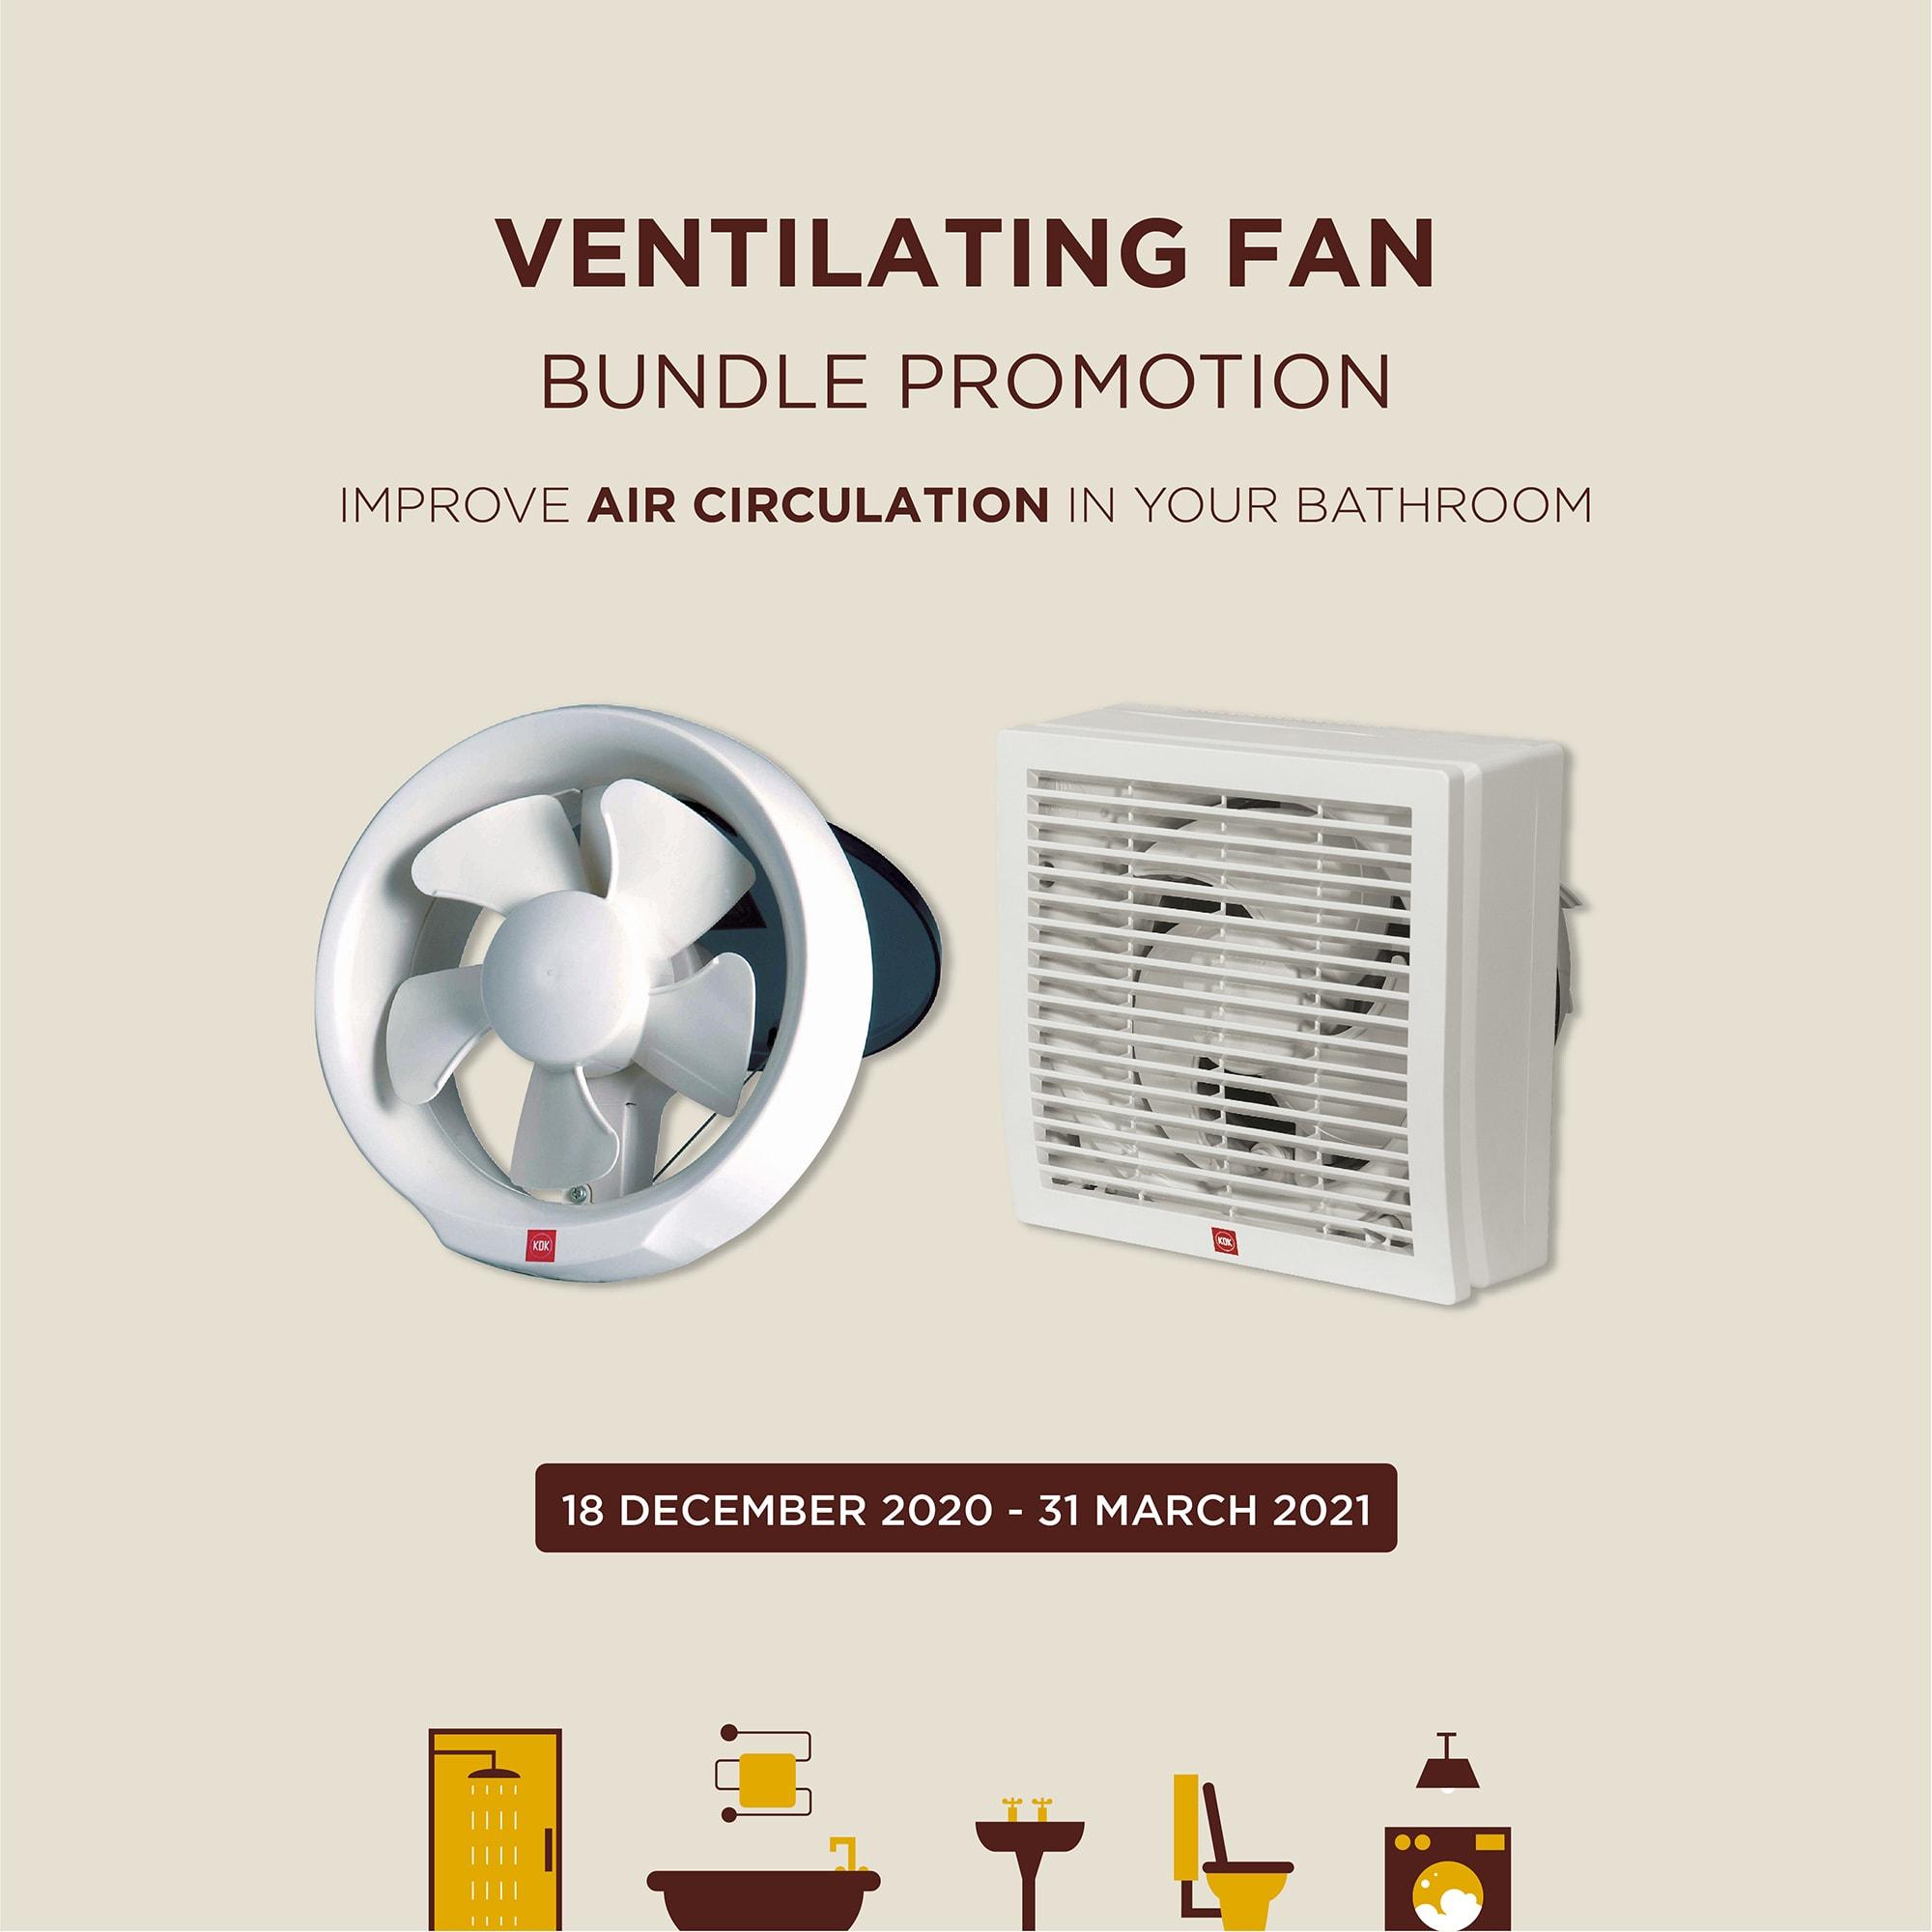 KDK Ventilating Fan Bundle Promotion